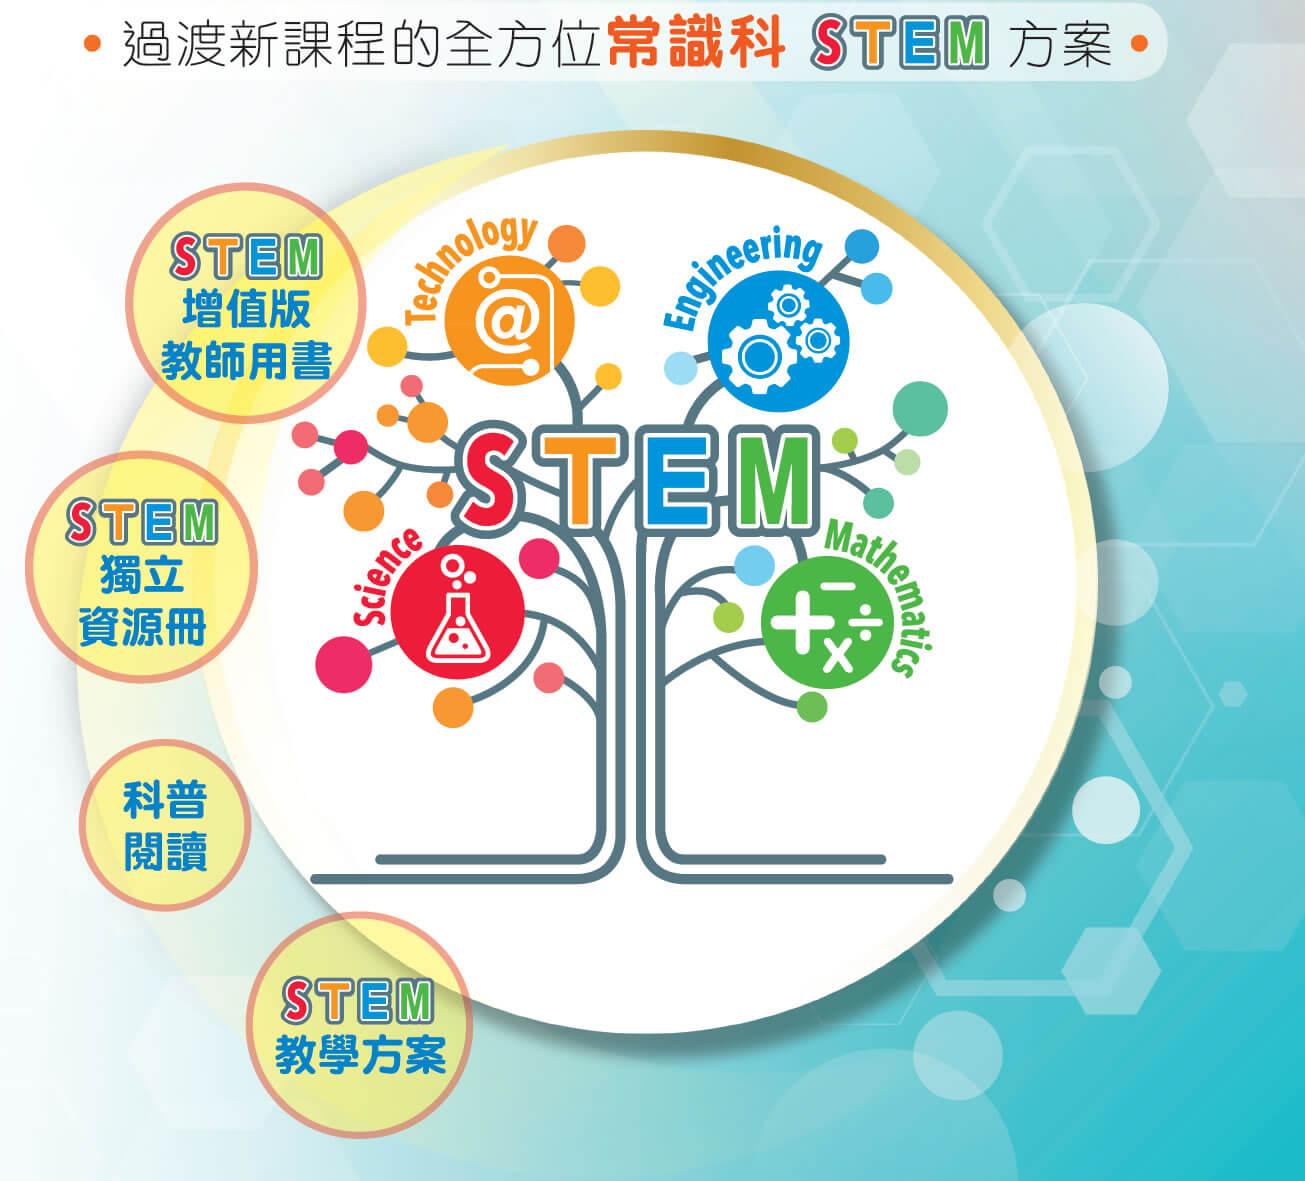 STEM In General Studies